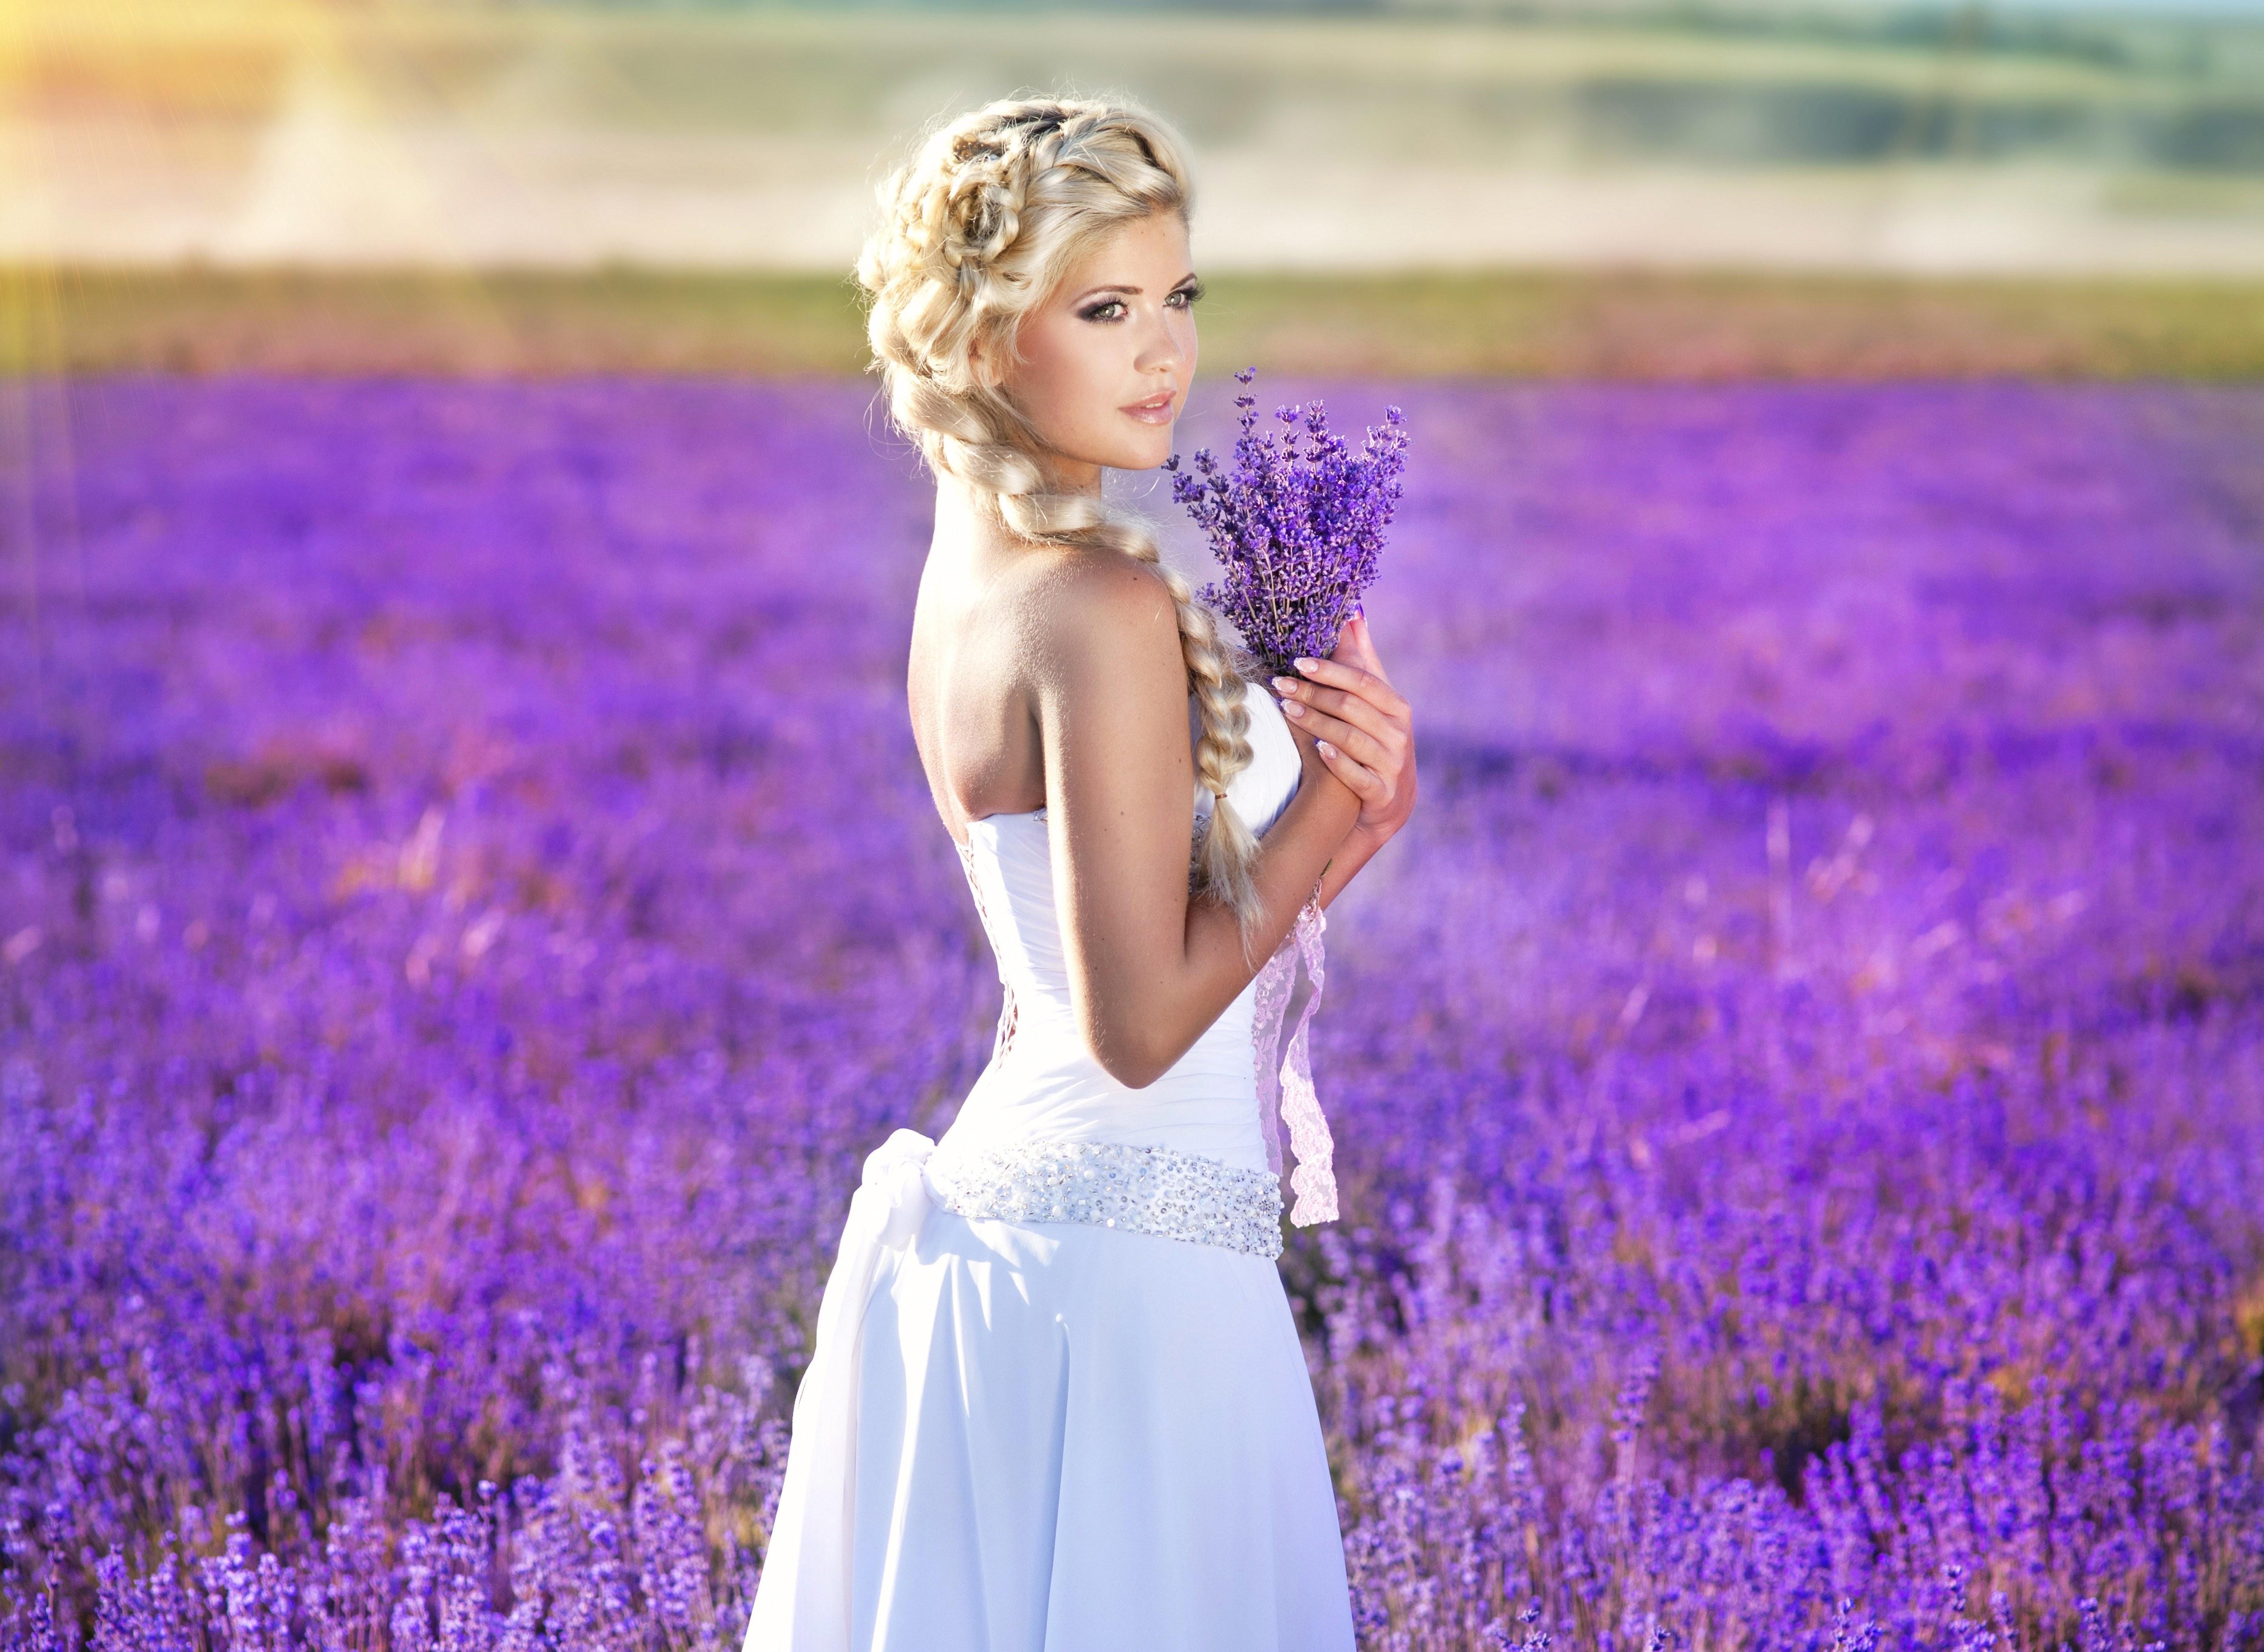 Wallpaper Sunlight Women Outdoors Model Blonde Depth Of Field